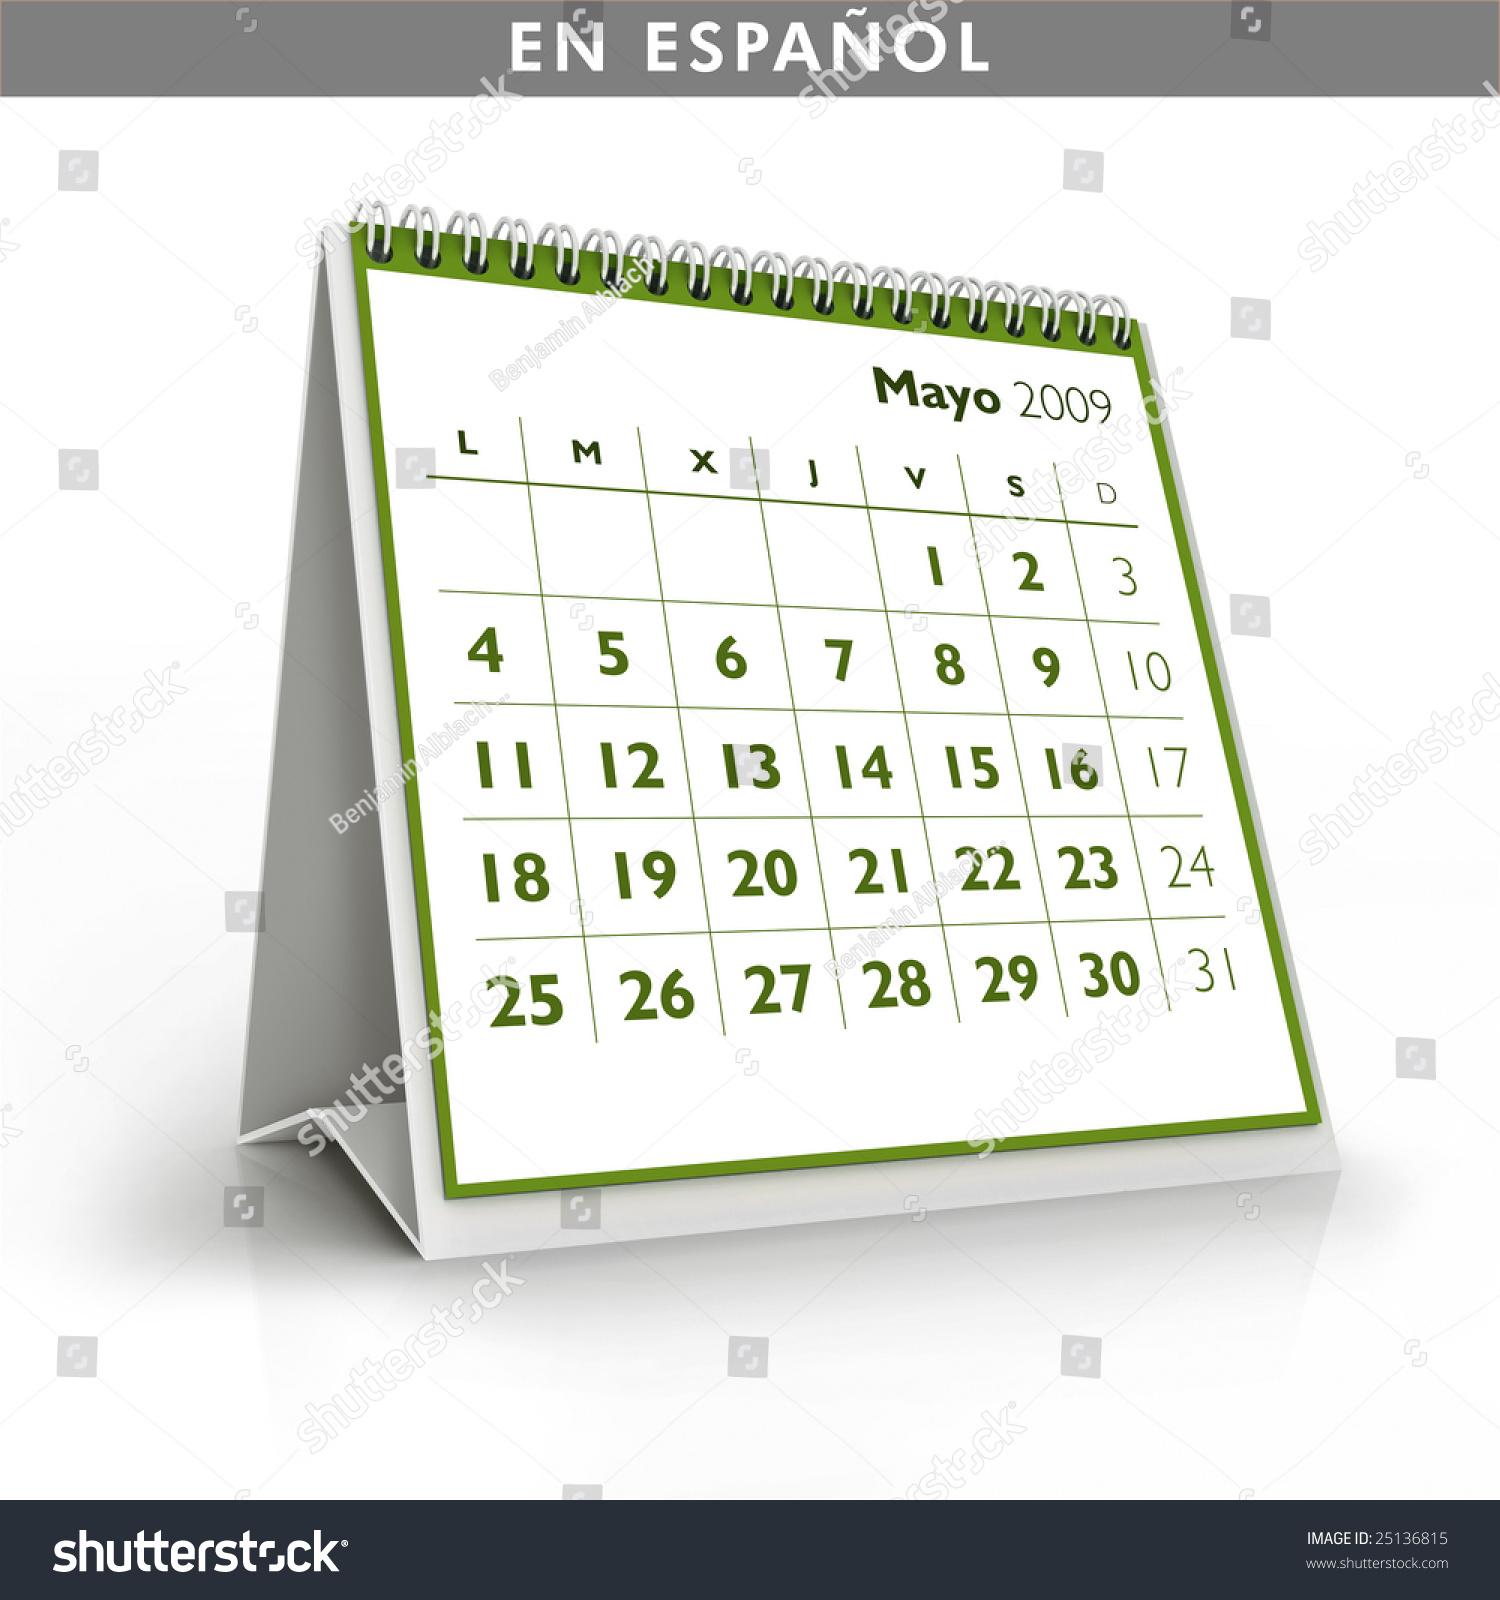 May Spanish Calendar : Calendar may spanish language stock photo